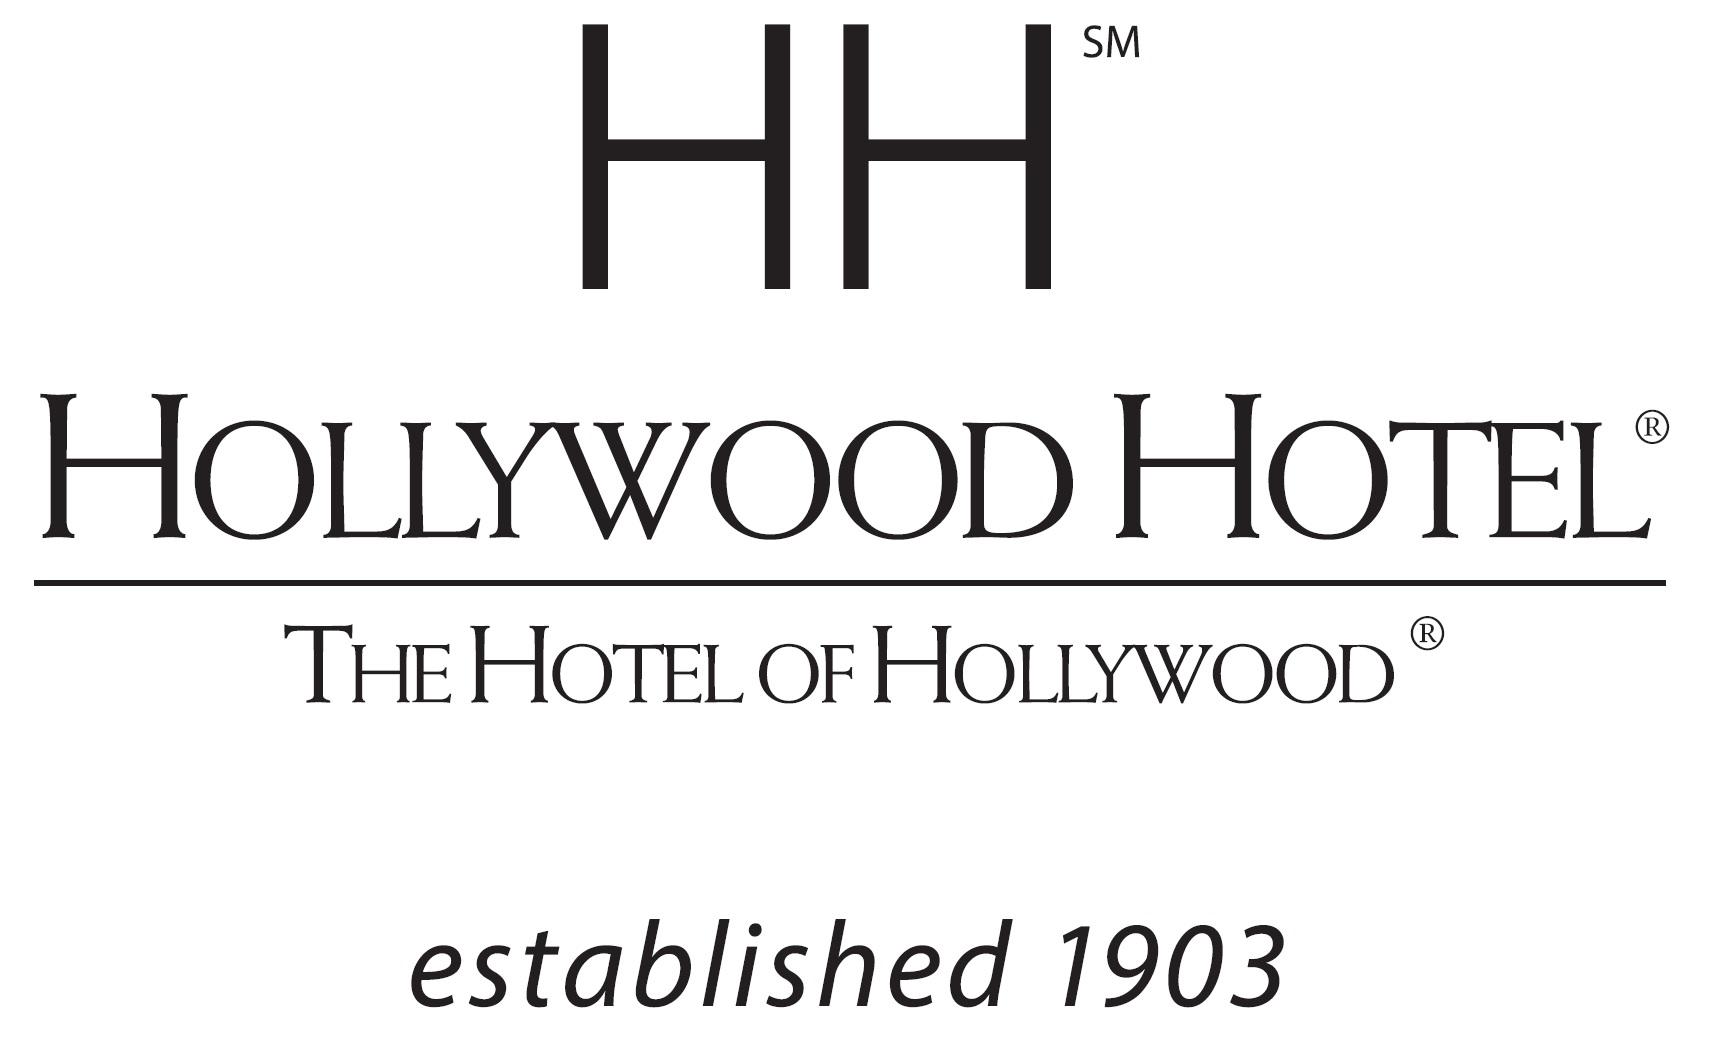 Hollywood Hotel 174 Los Angeles California Ca